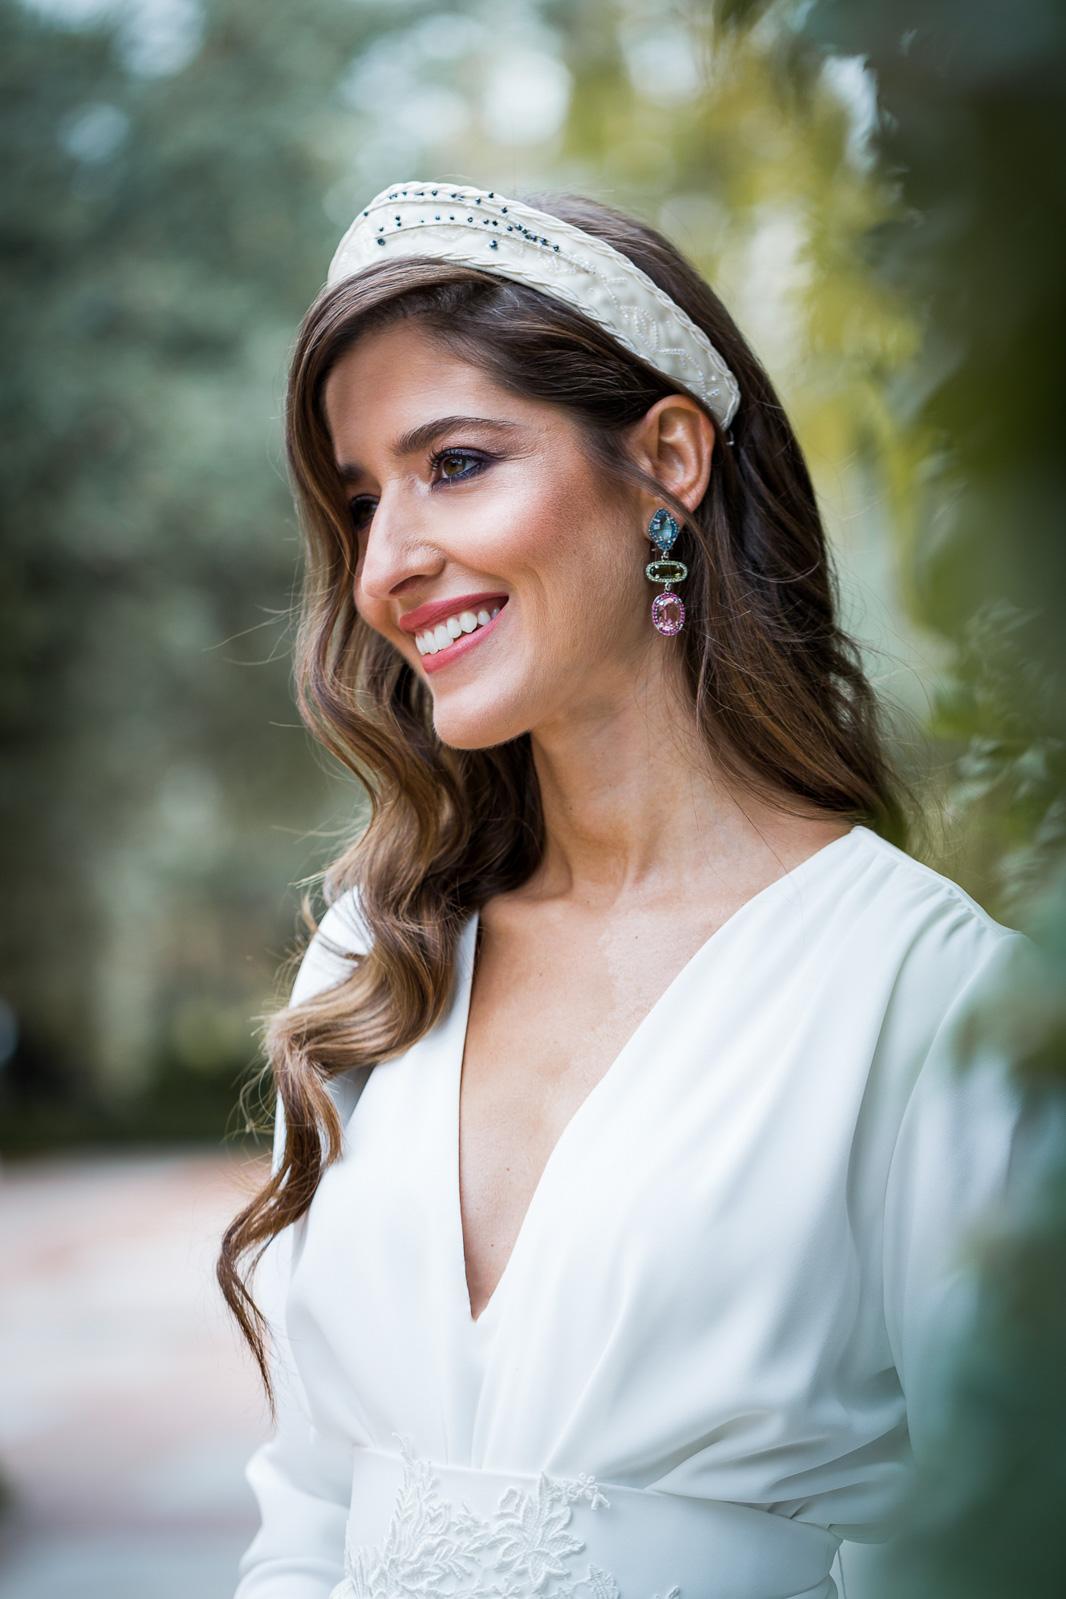 Pendientes novia personalizados rosa azul customima